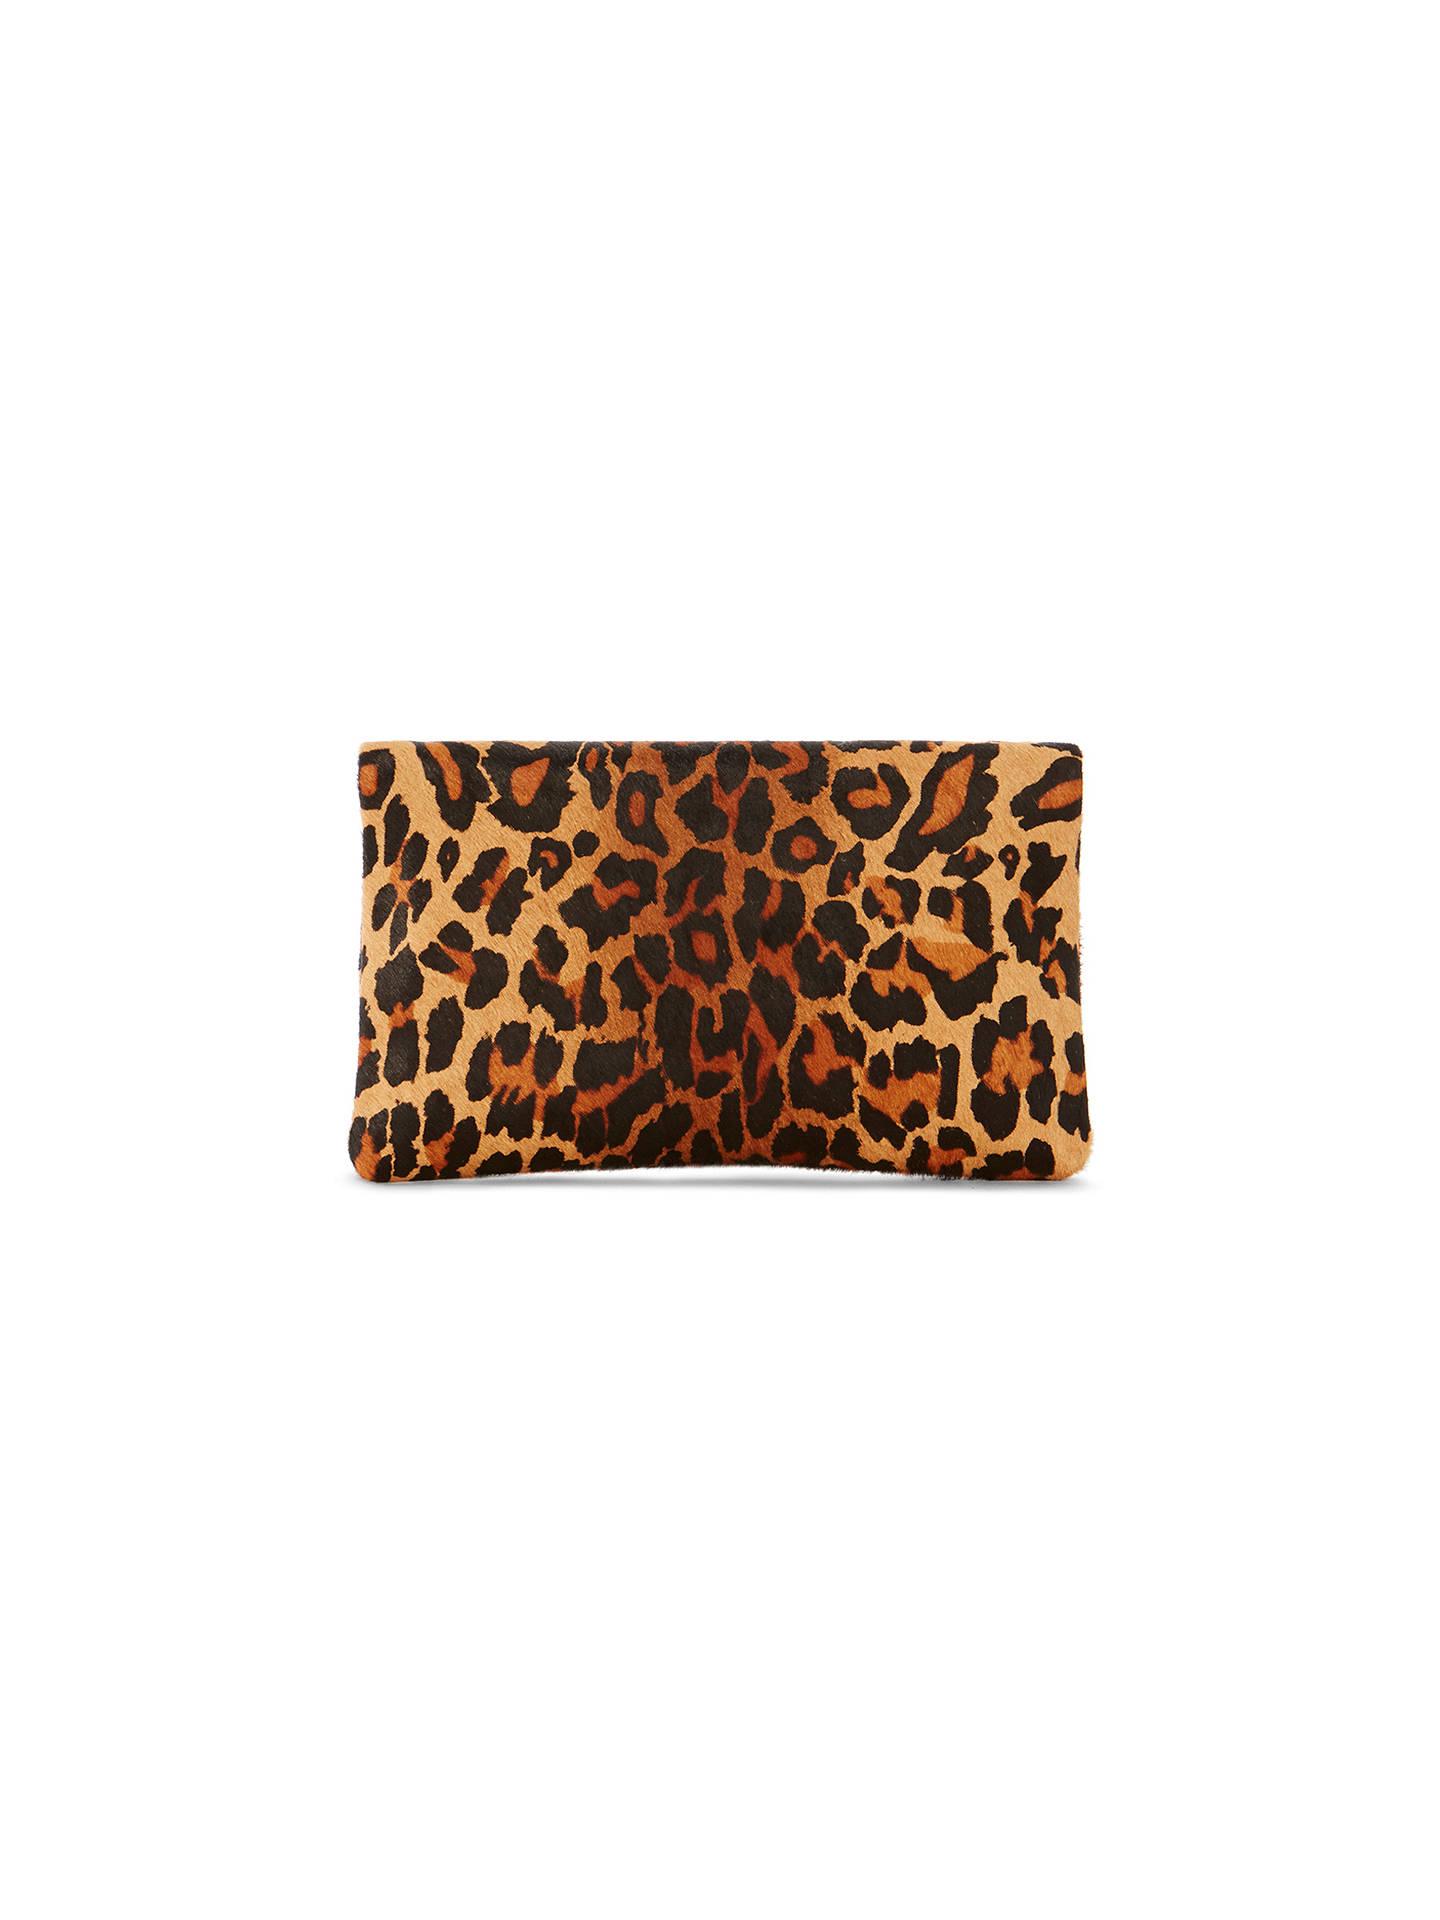 e9ccddded588 ... Buy Karen Millen Leopard Print Leather Brompton Clutch Bag, Multi  Online at johnlewis.com ...